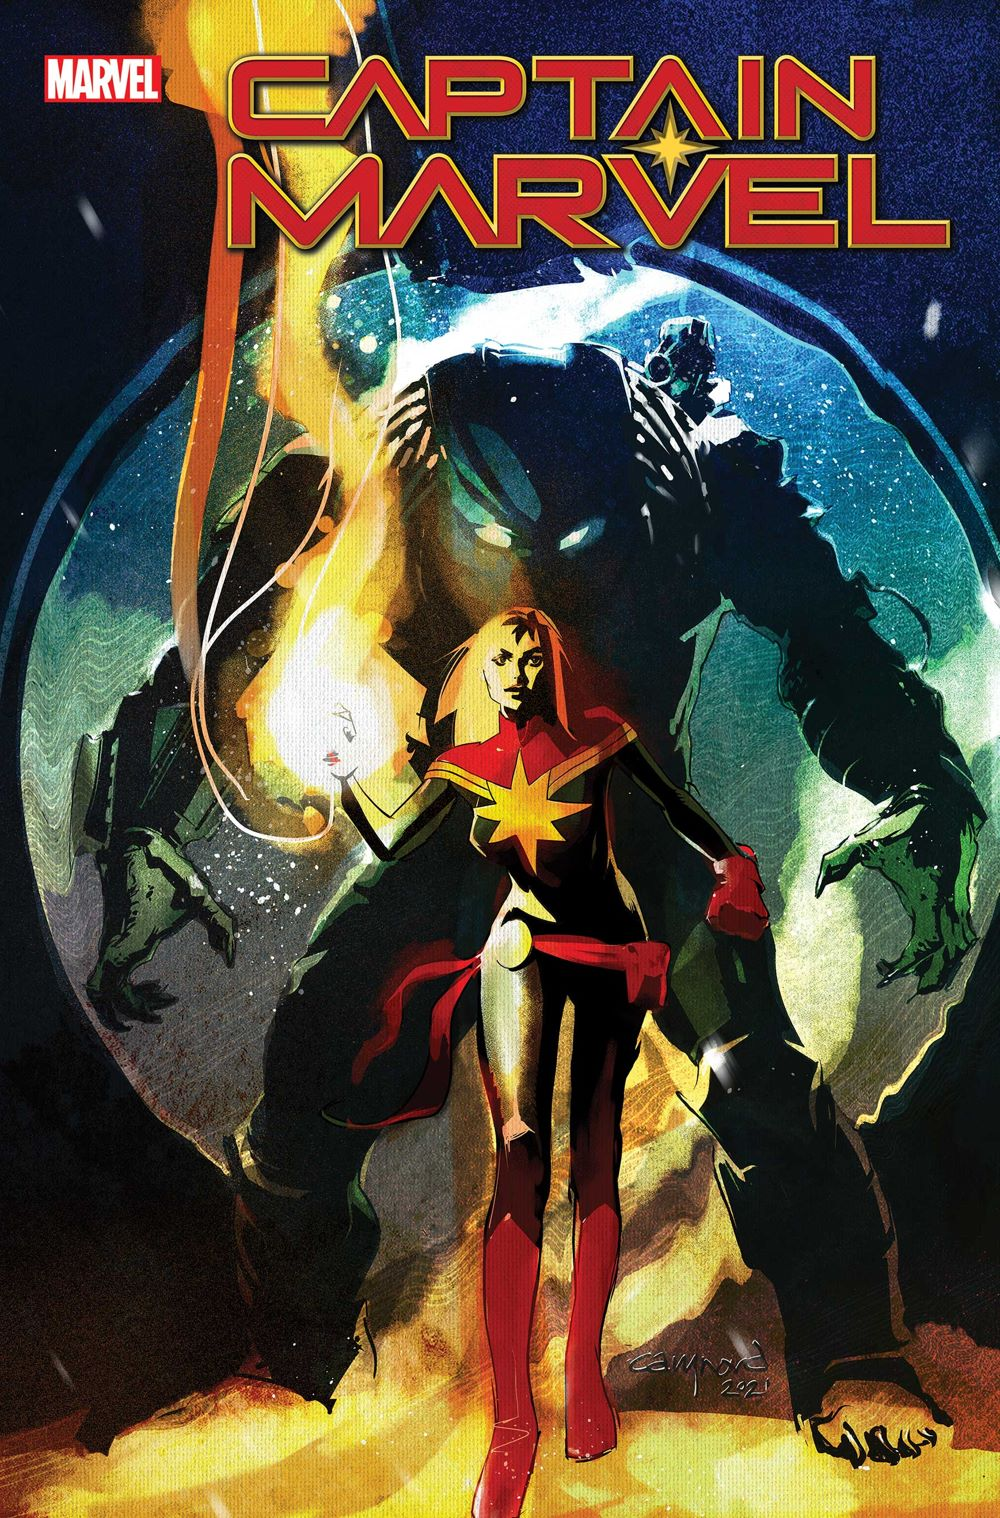 CAPMARV2019029_PredatorVar Marvel Comics June 2021 Solicitations